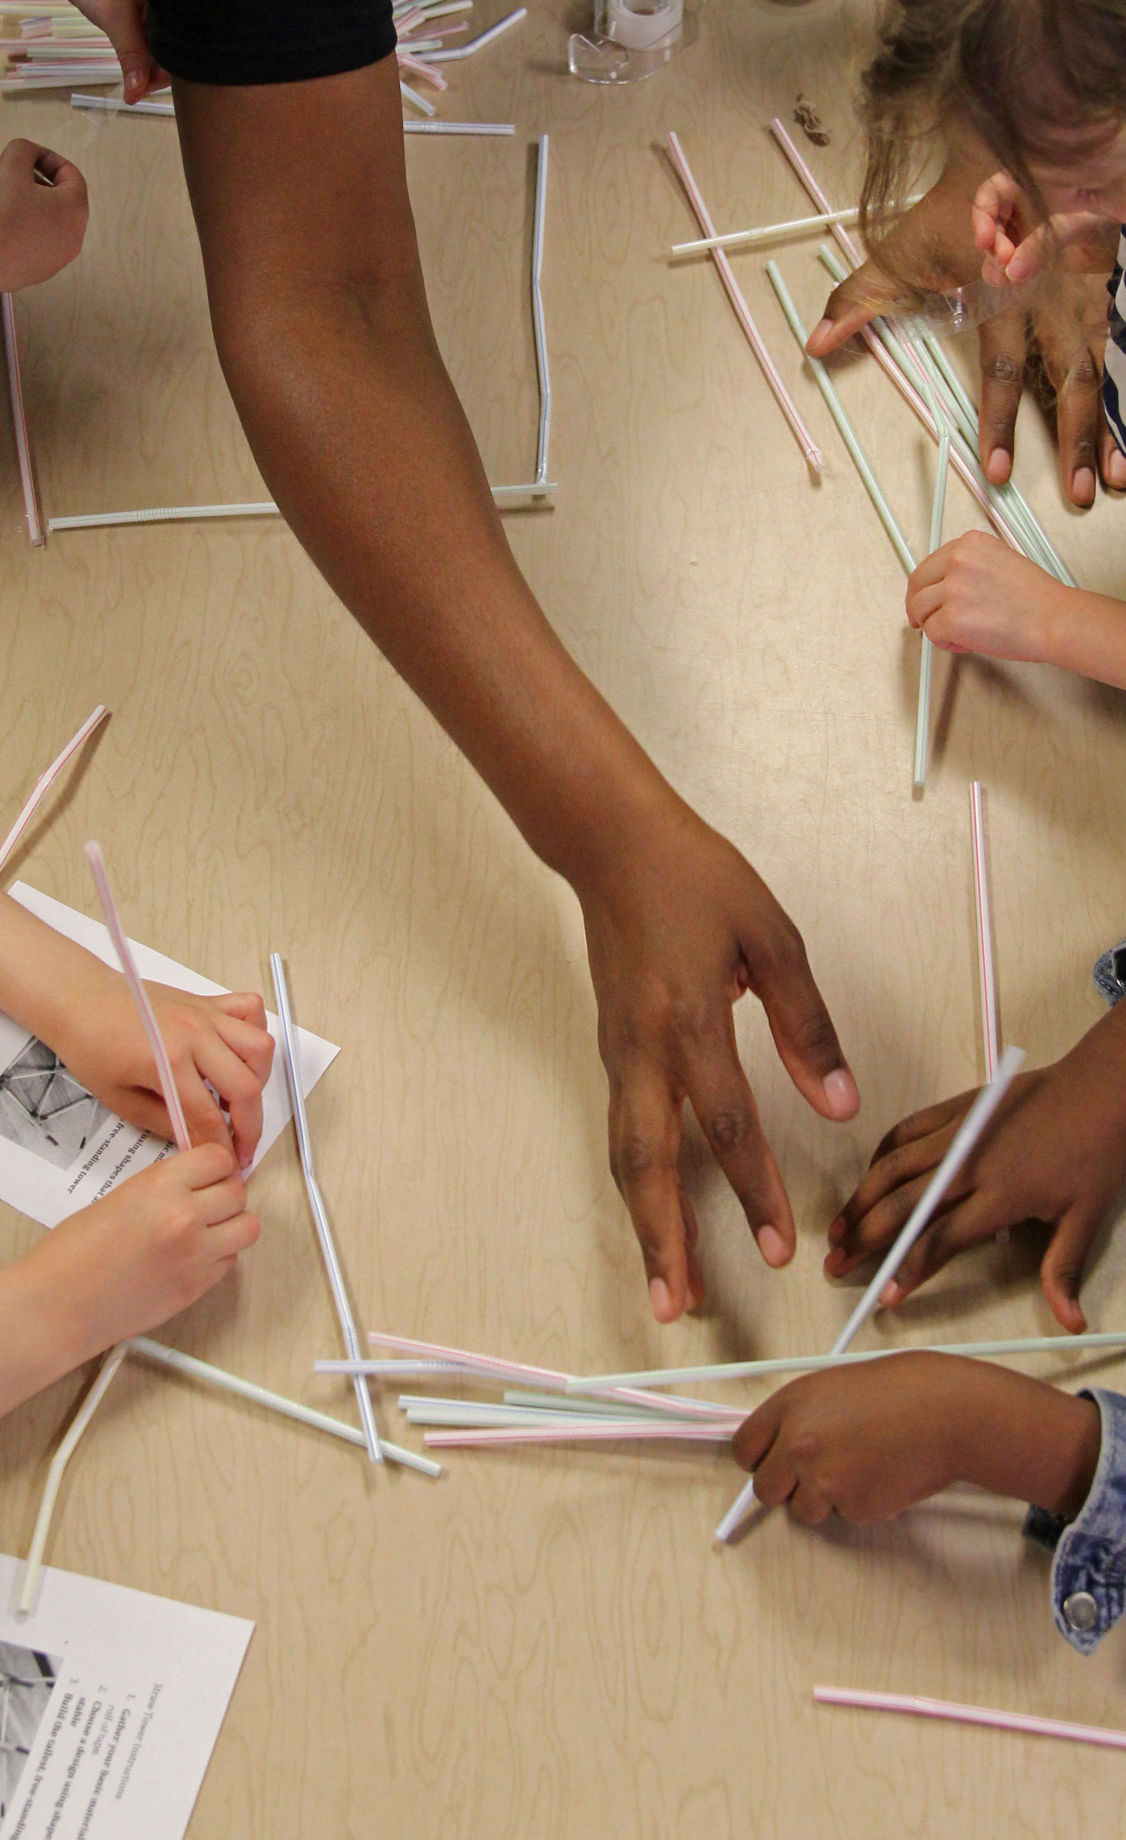 MavsChallenge runner up uses builder kit to get kids excited about STEM